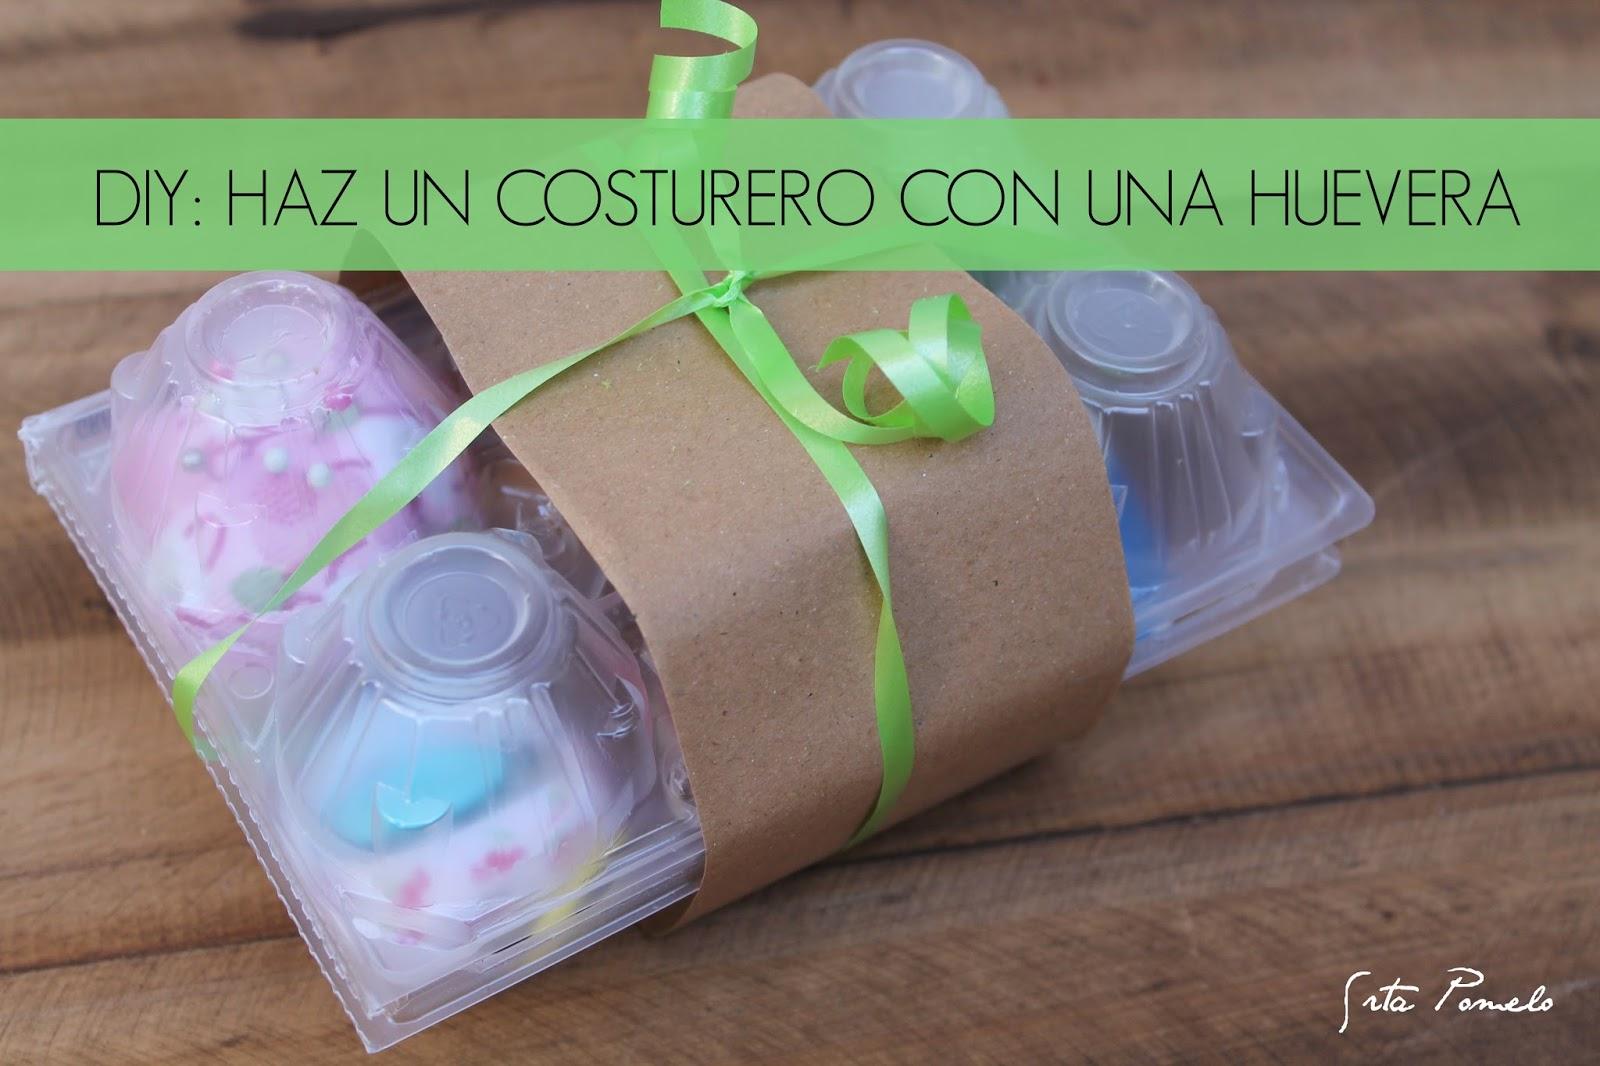 DIY Costurero huevera